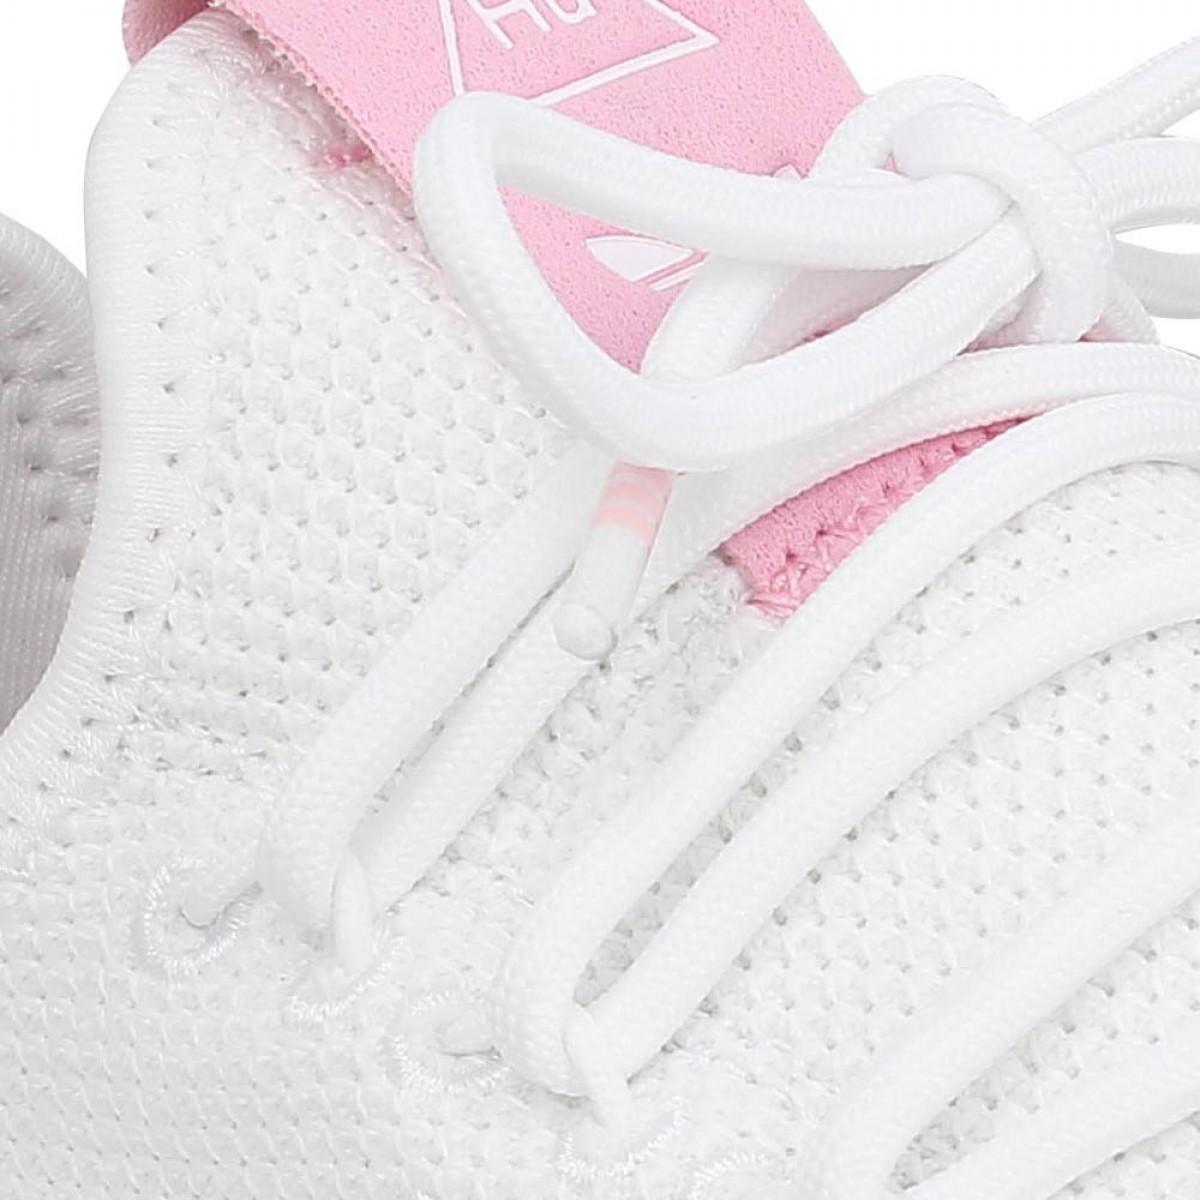 Chaussures Adidas x pharrell williams pw tennis mesh femme